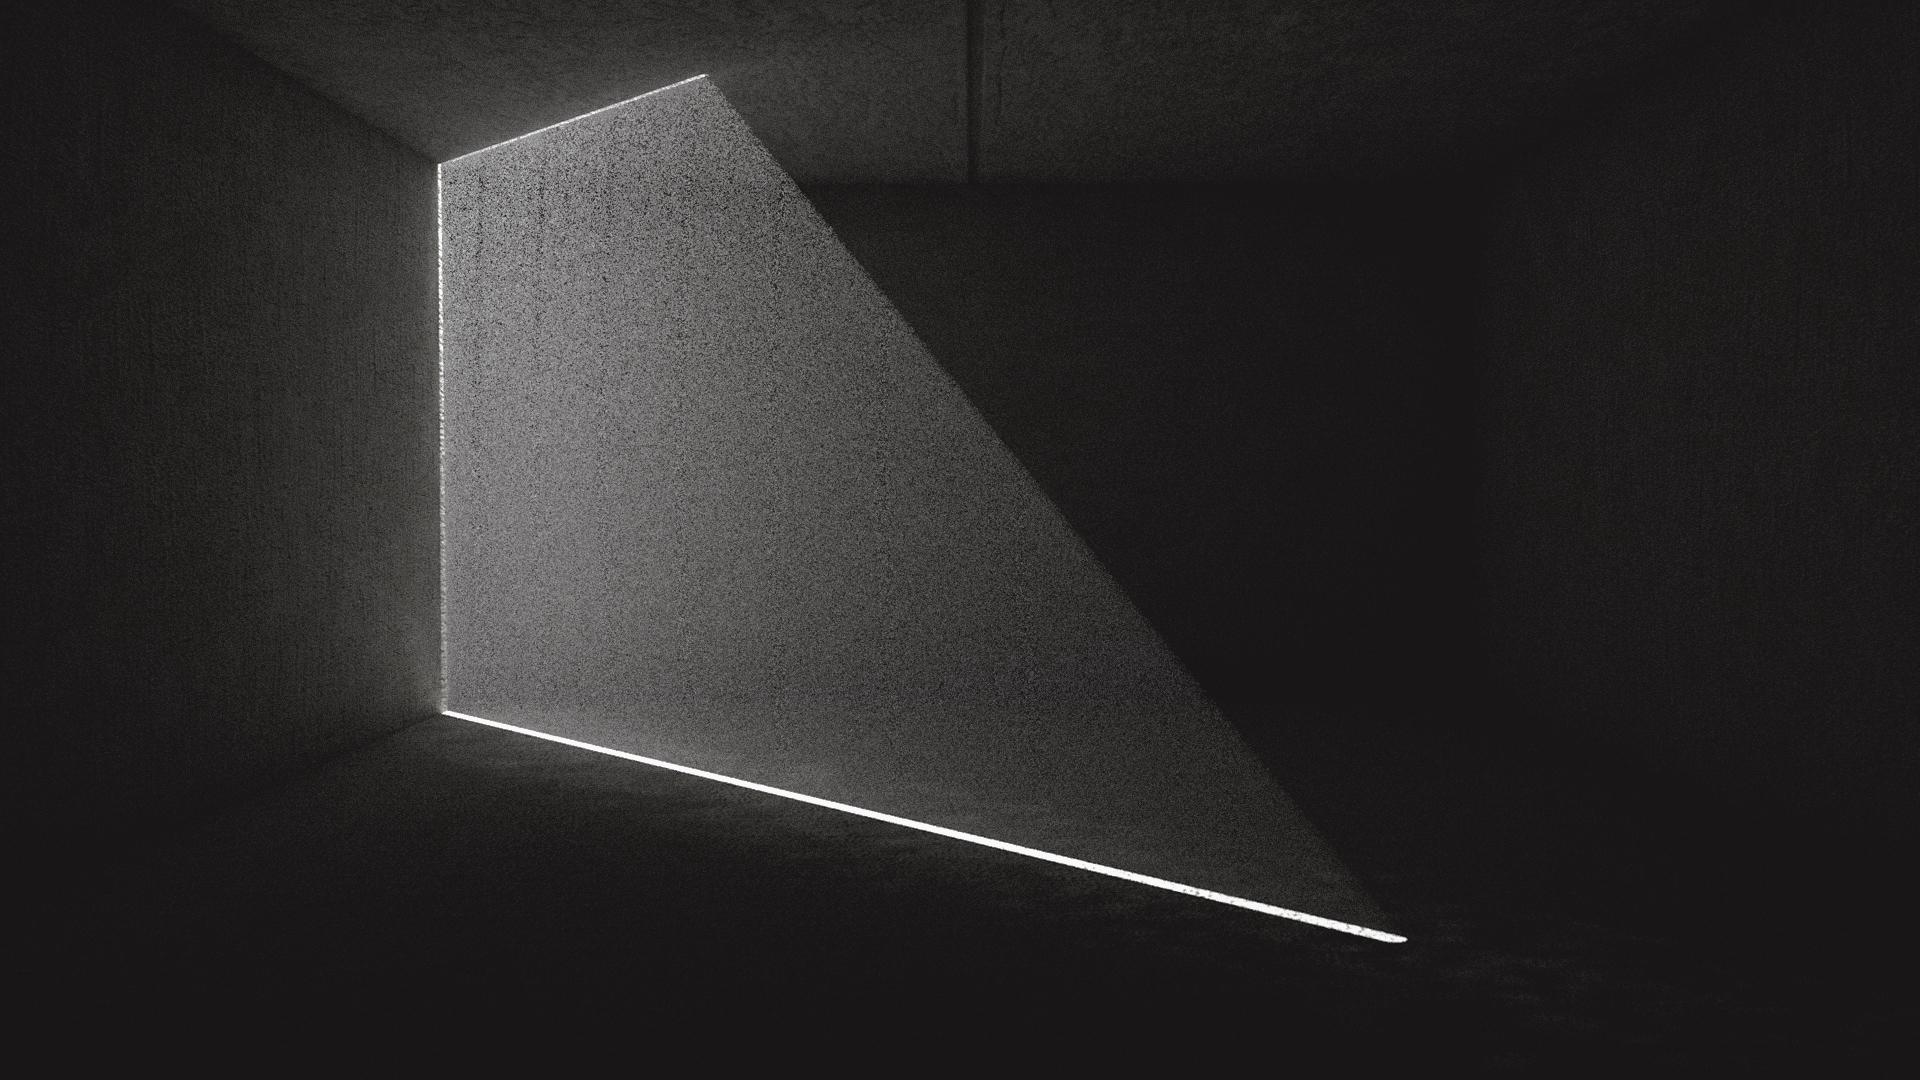 LIGHTLEAK - 3.2.16